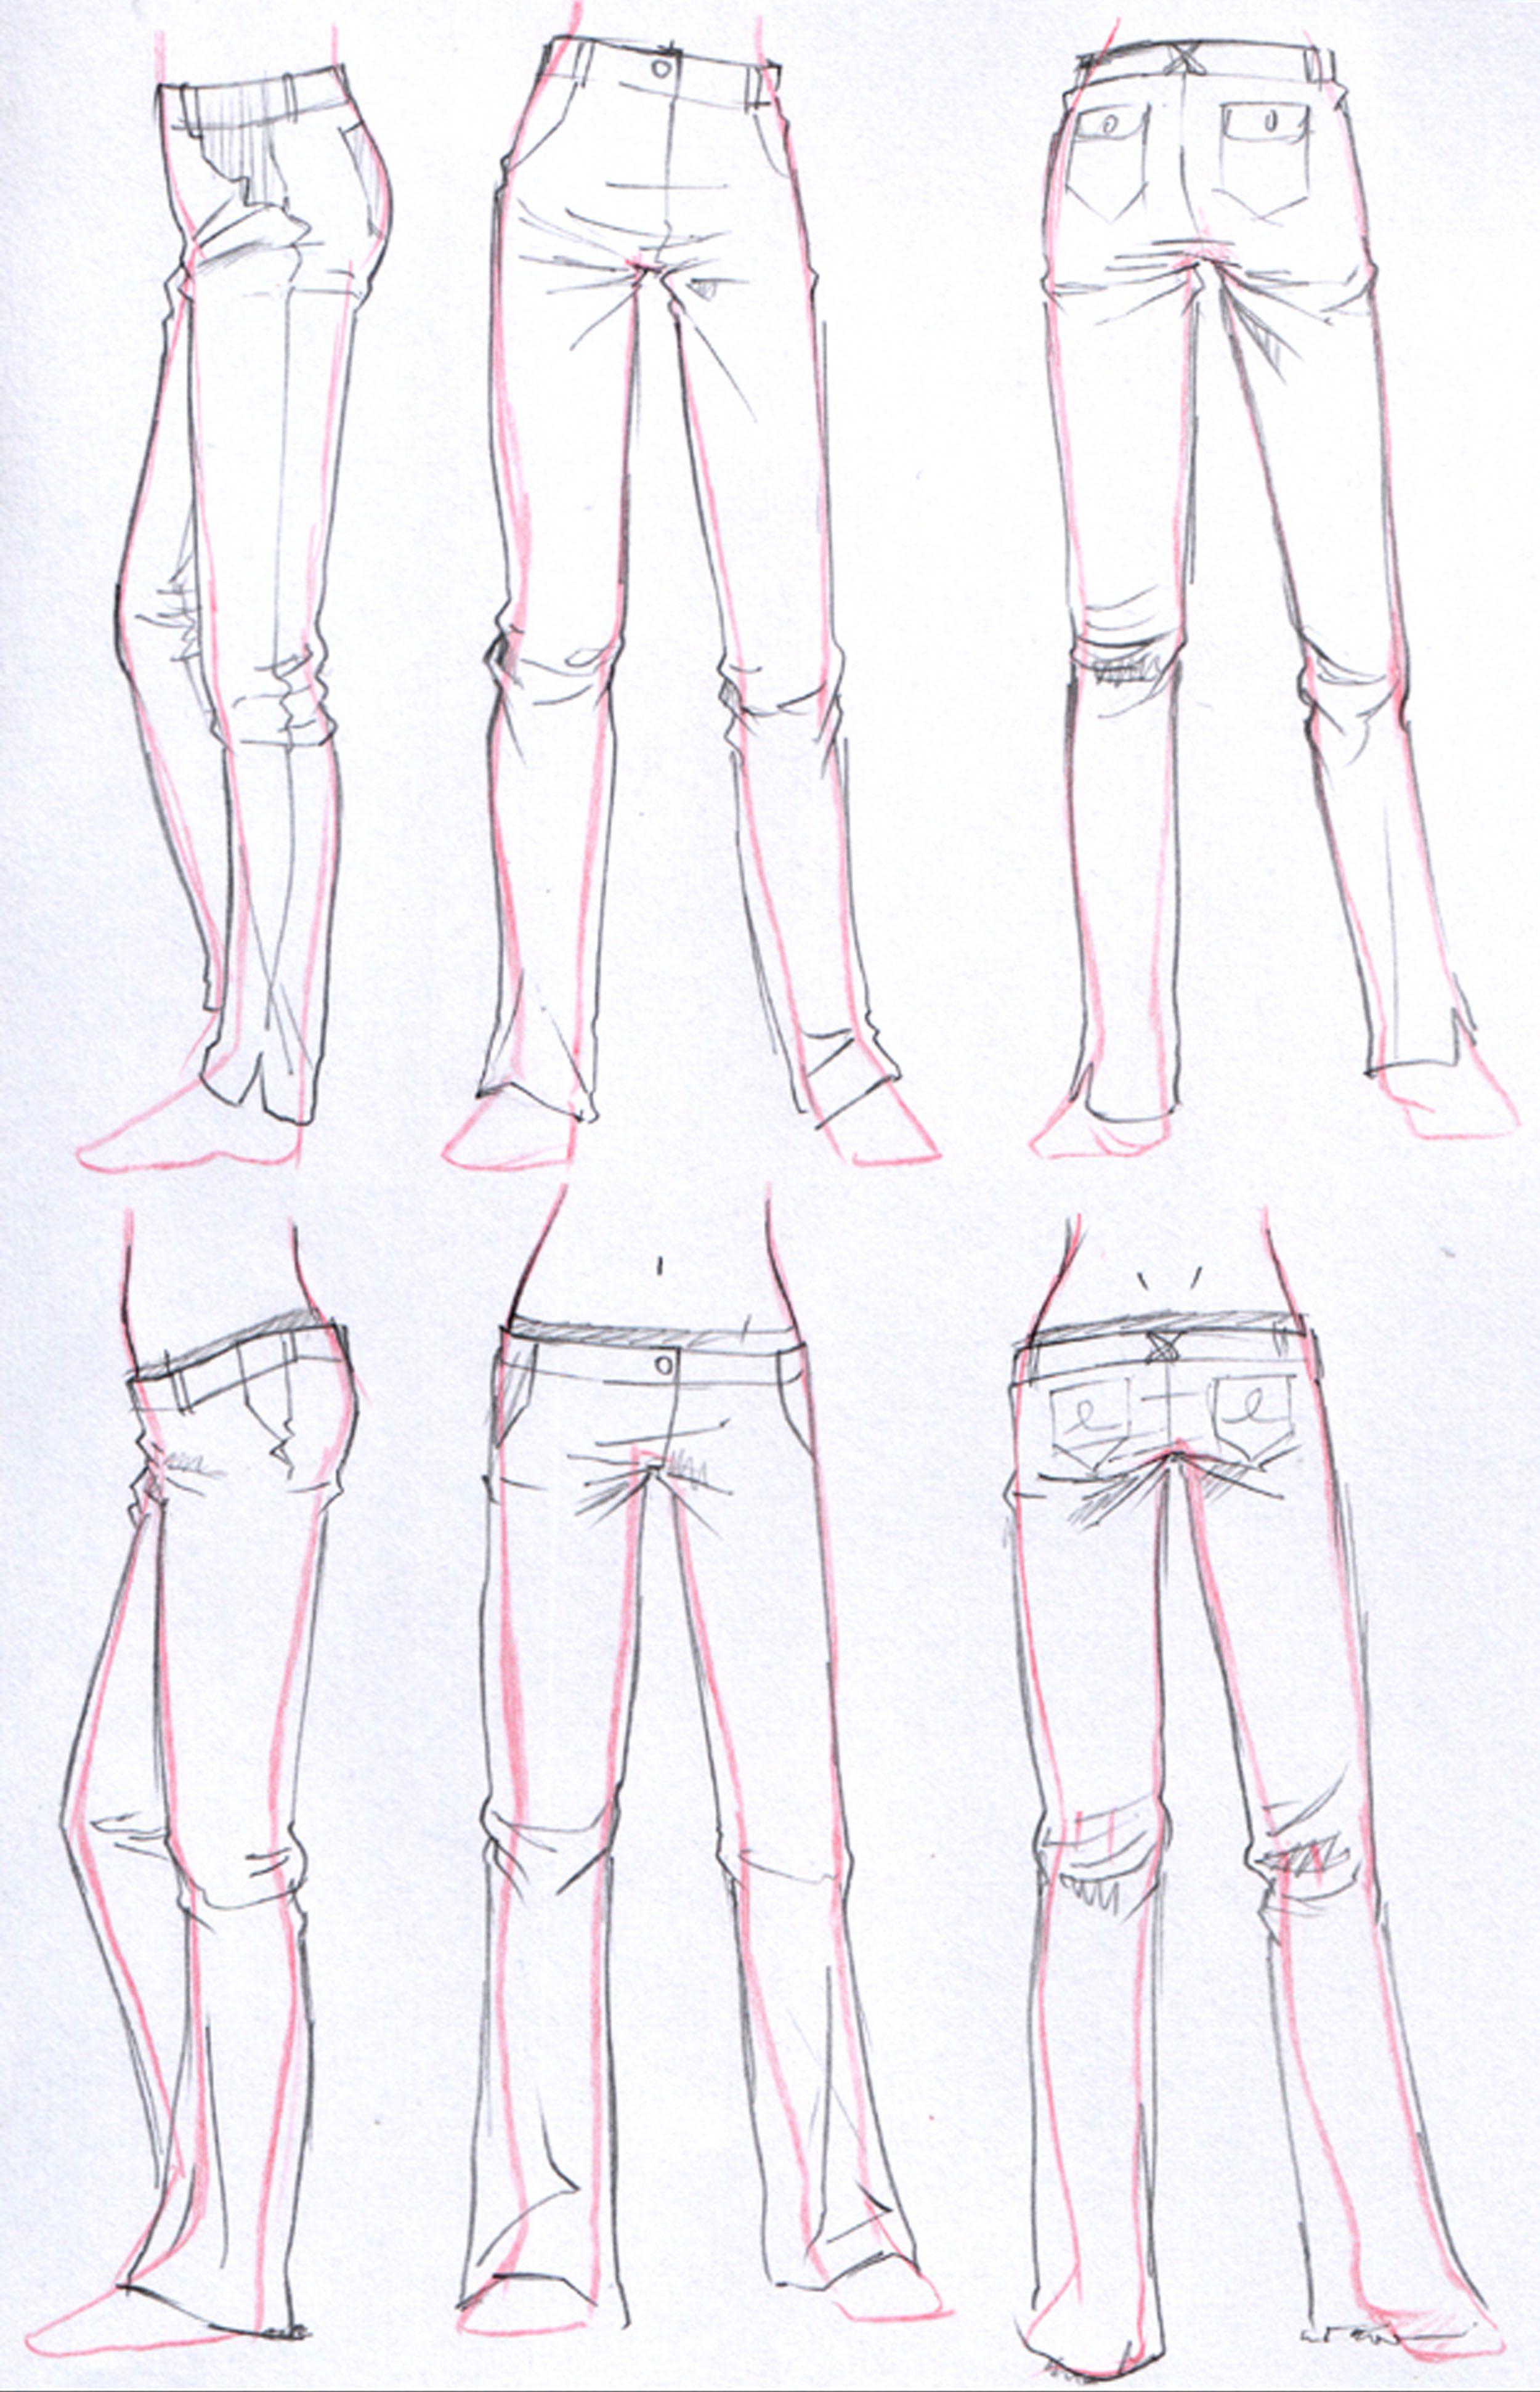 6 Pantalones Ropa Para Dibujar Como Dibujar Ropa Ropa Dibujo